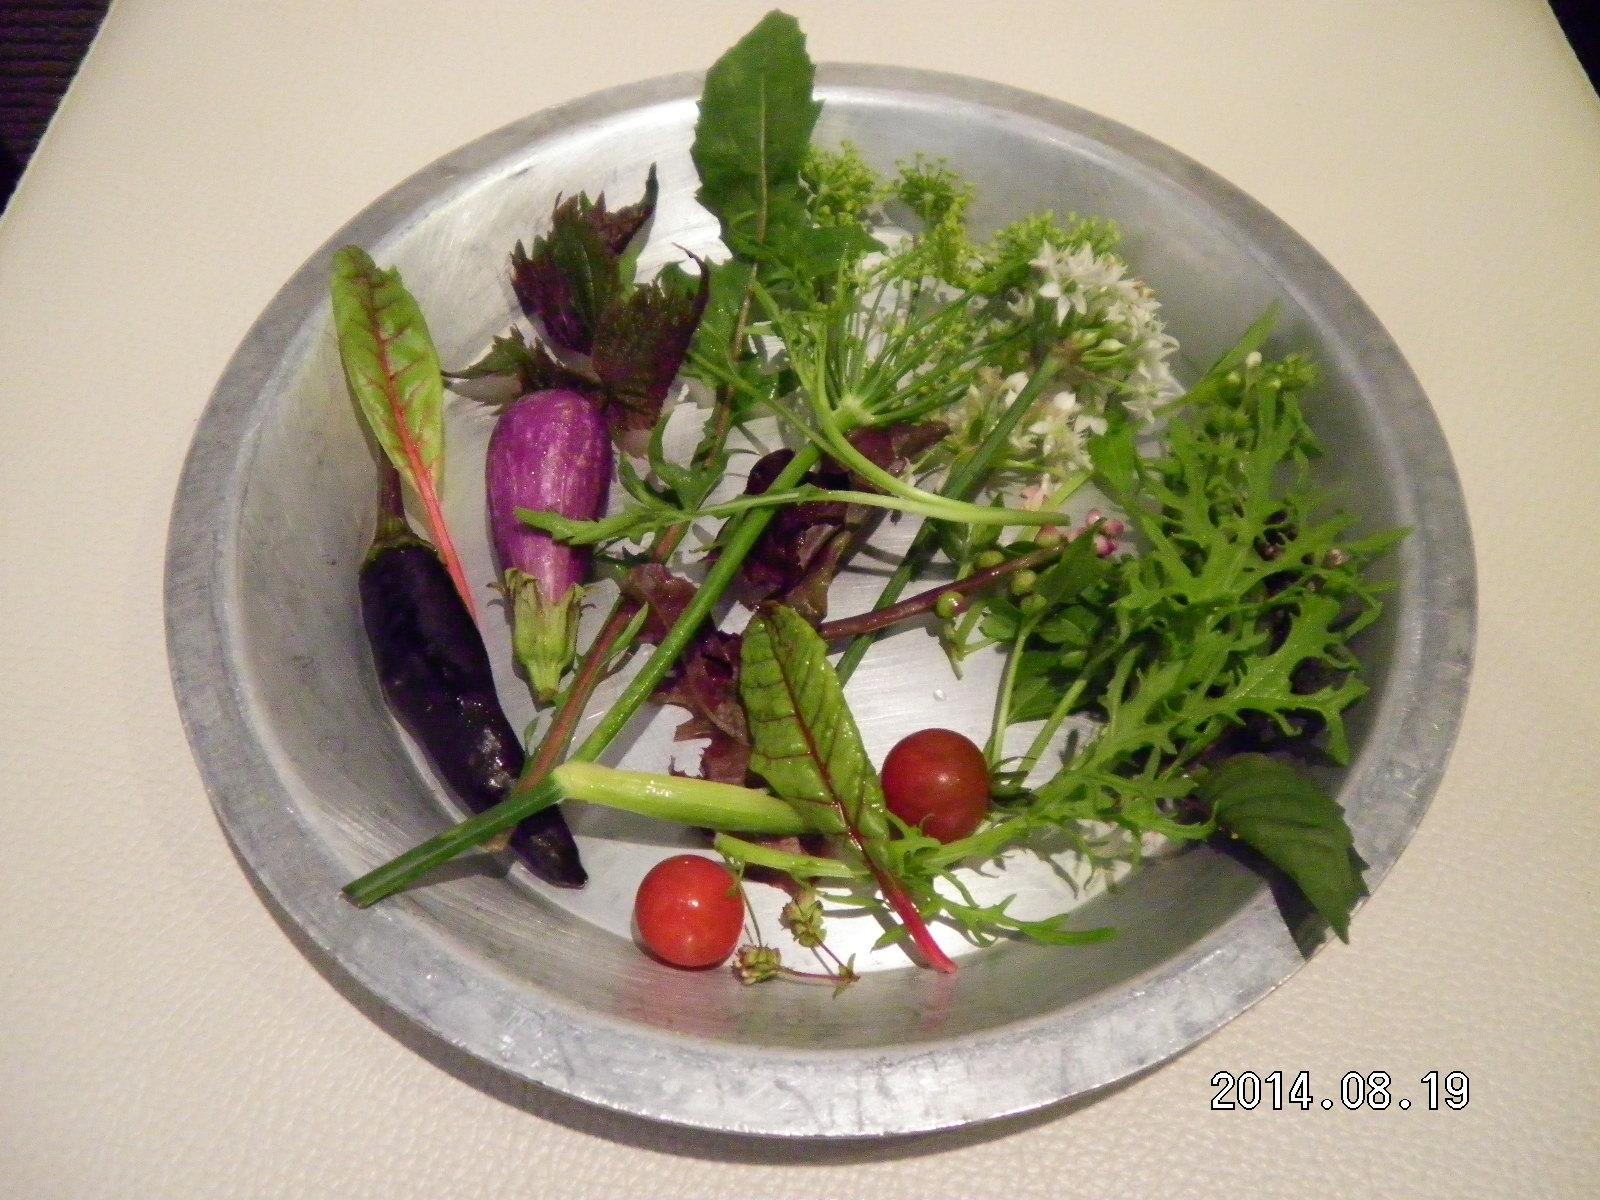 第43回お料理教室_e0190287_1813650.jpg